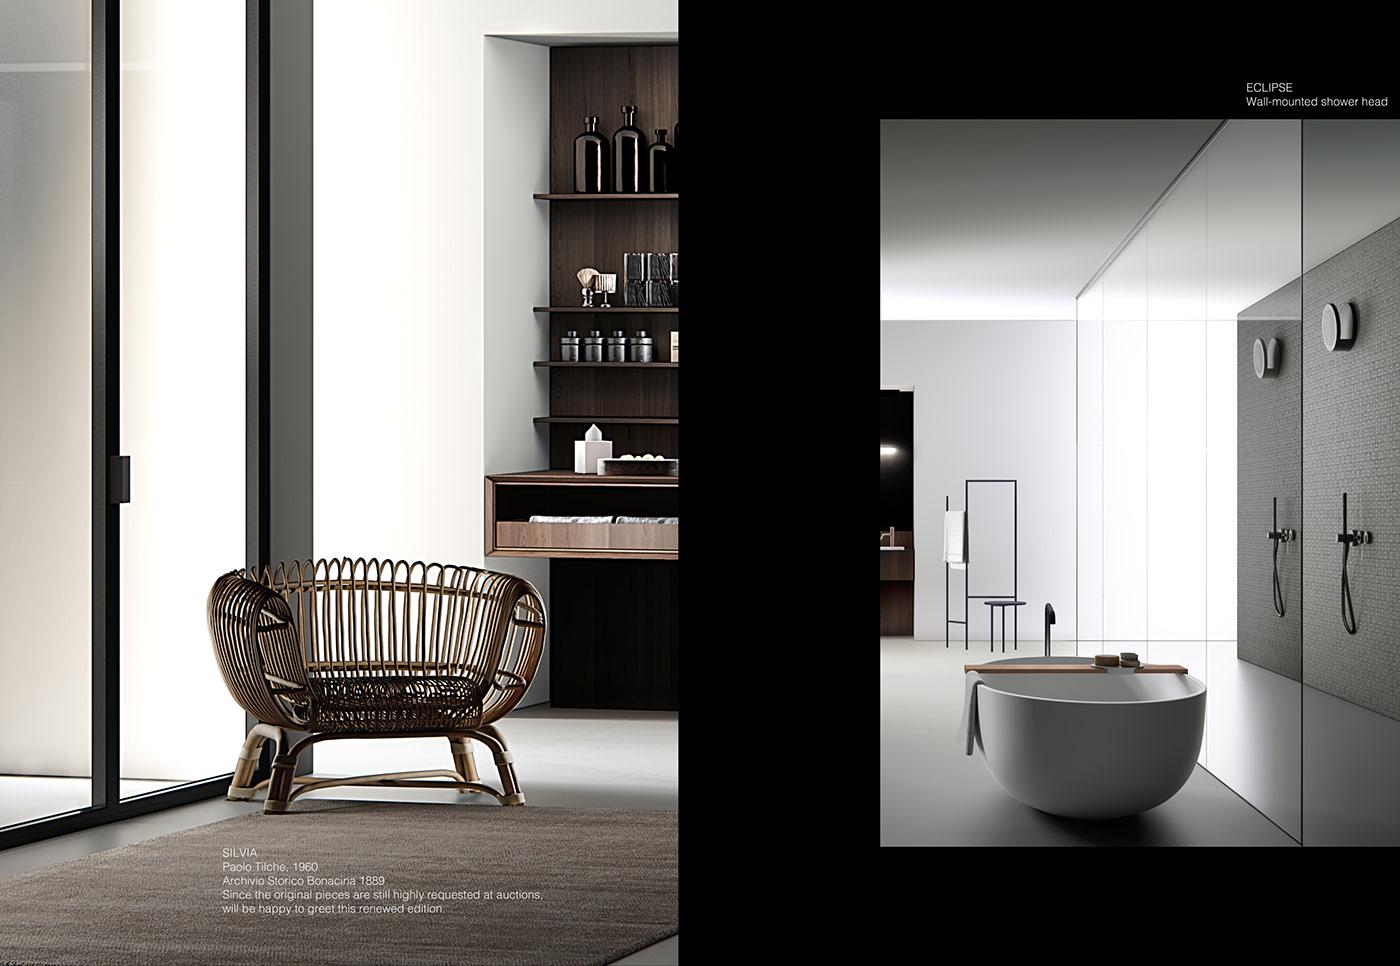 bathroom bathroom-unit bathtube Boffi brochure Catalogue Faucet sanitary wardrobe